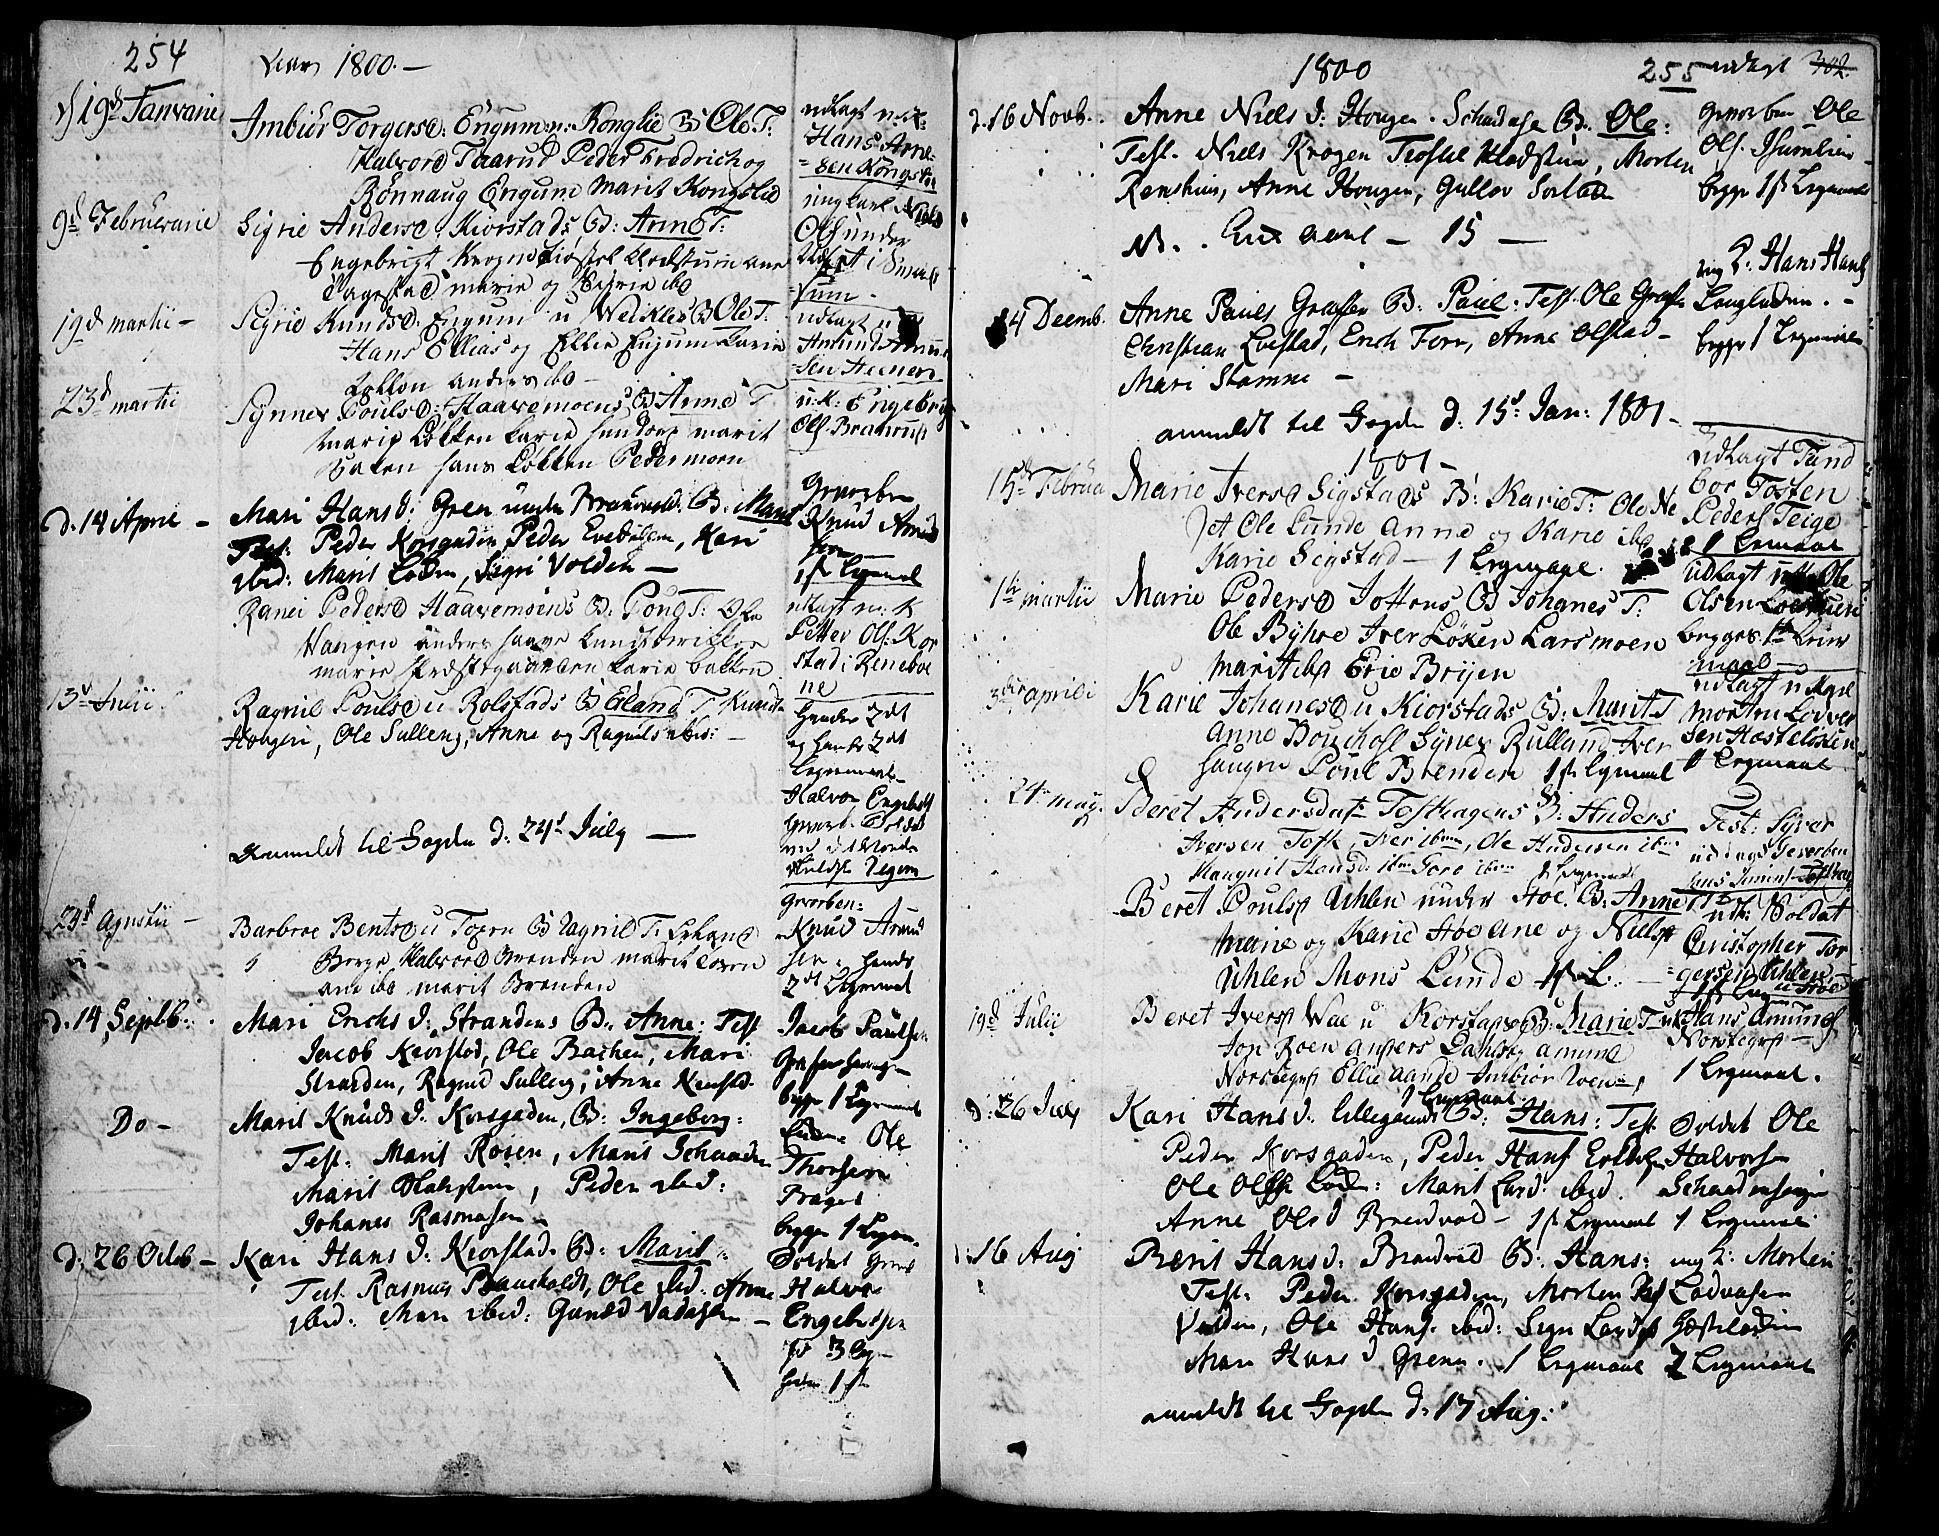 SAH, Fron prestekontor, H/Ha/Haa/L0001: Ministerialbok nr. 1, 1799-1816, s. 254-255